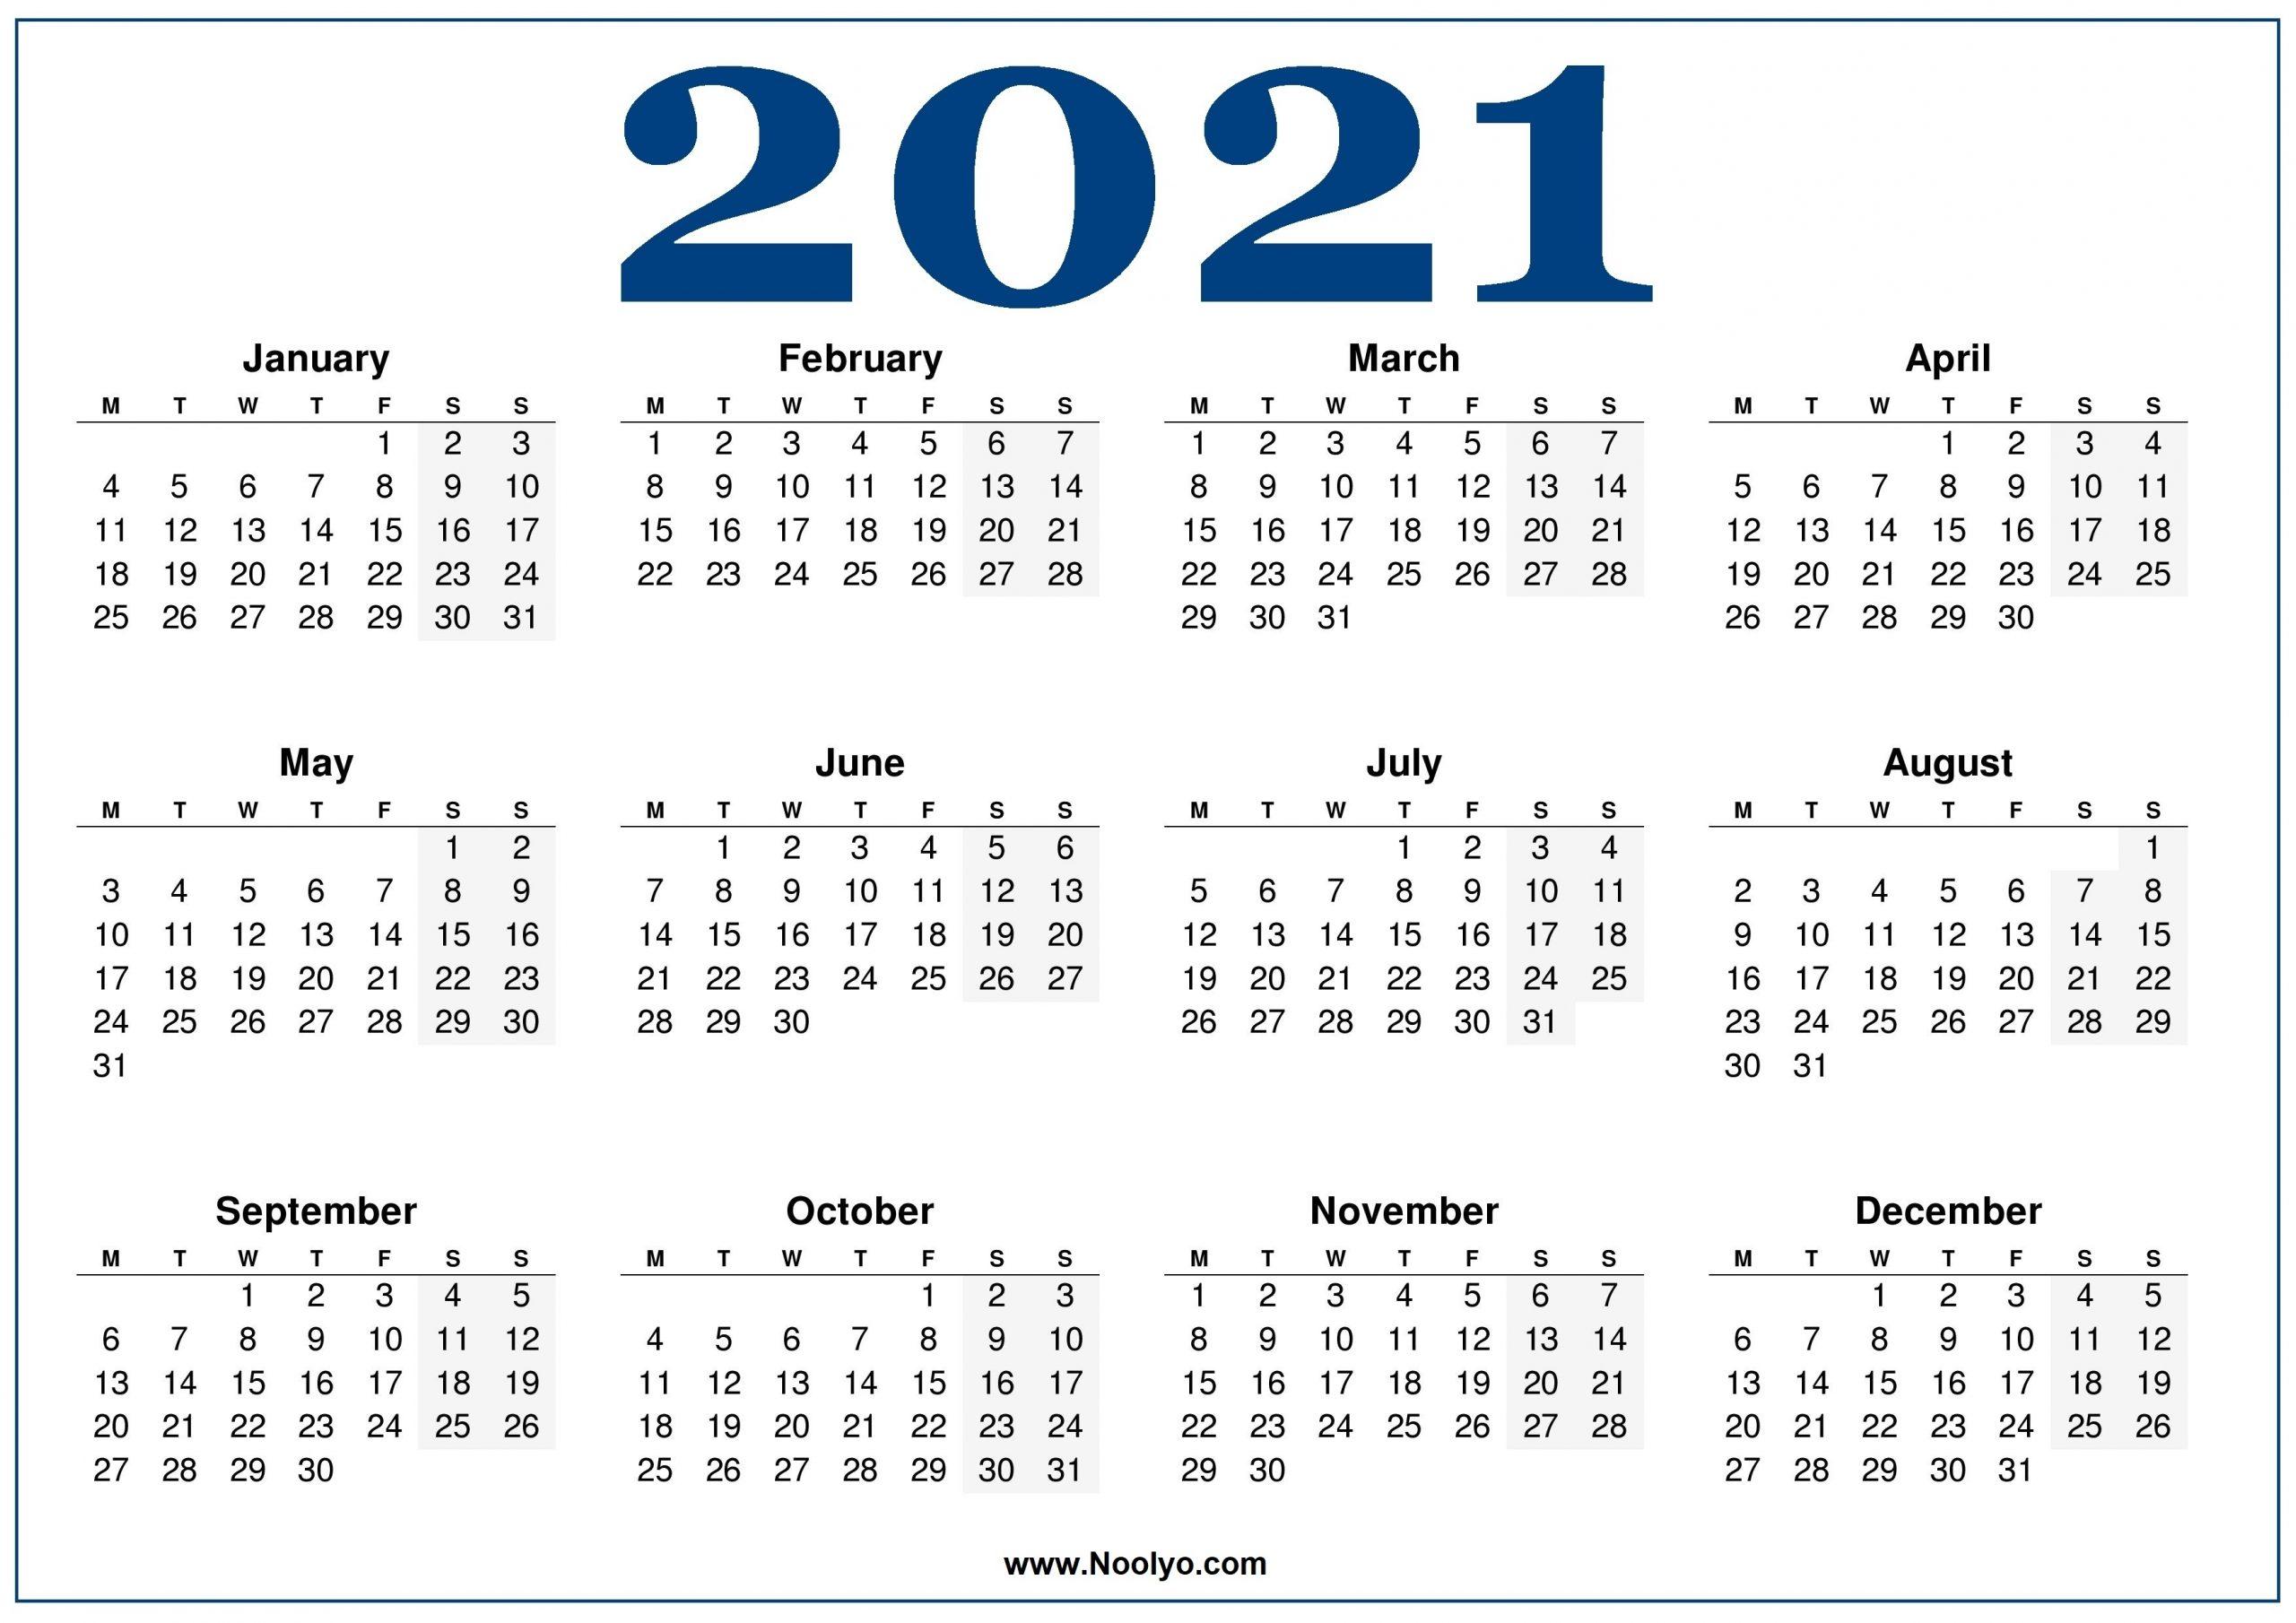 Monday Week Start Calendar 2021 Blue – Noolyo